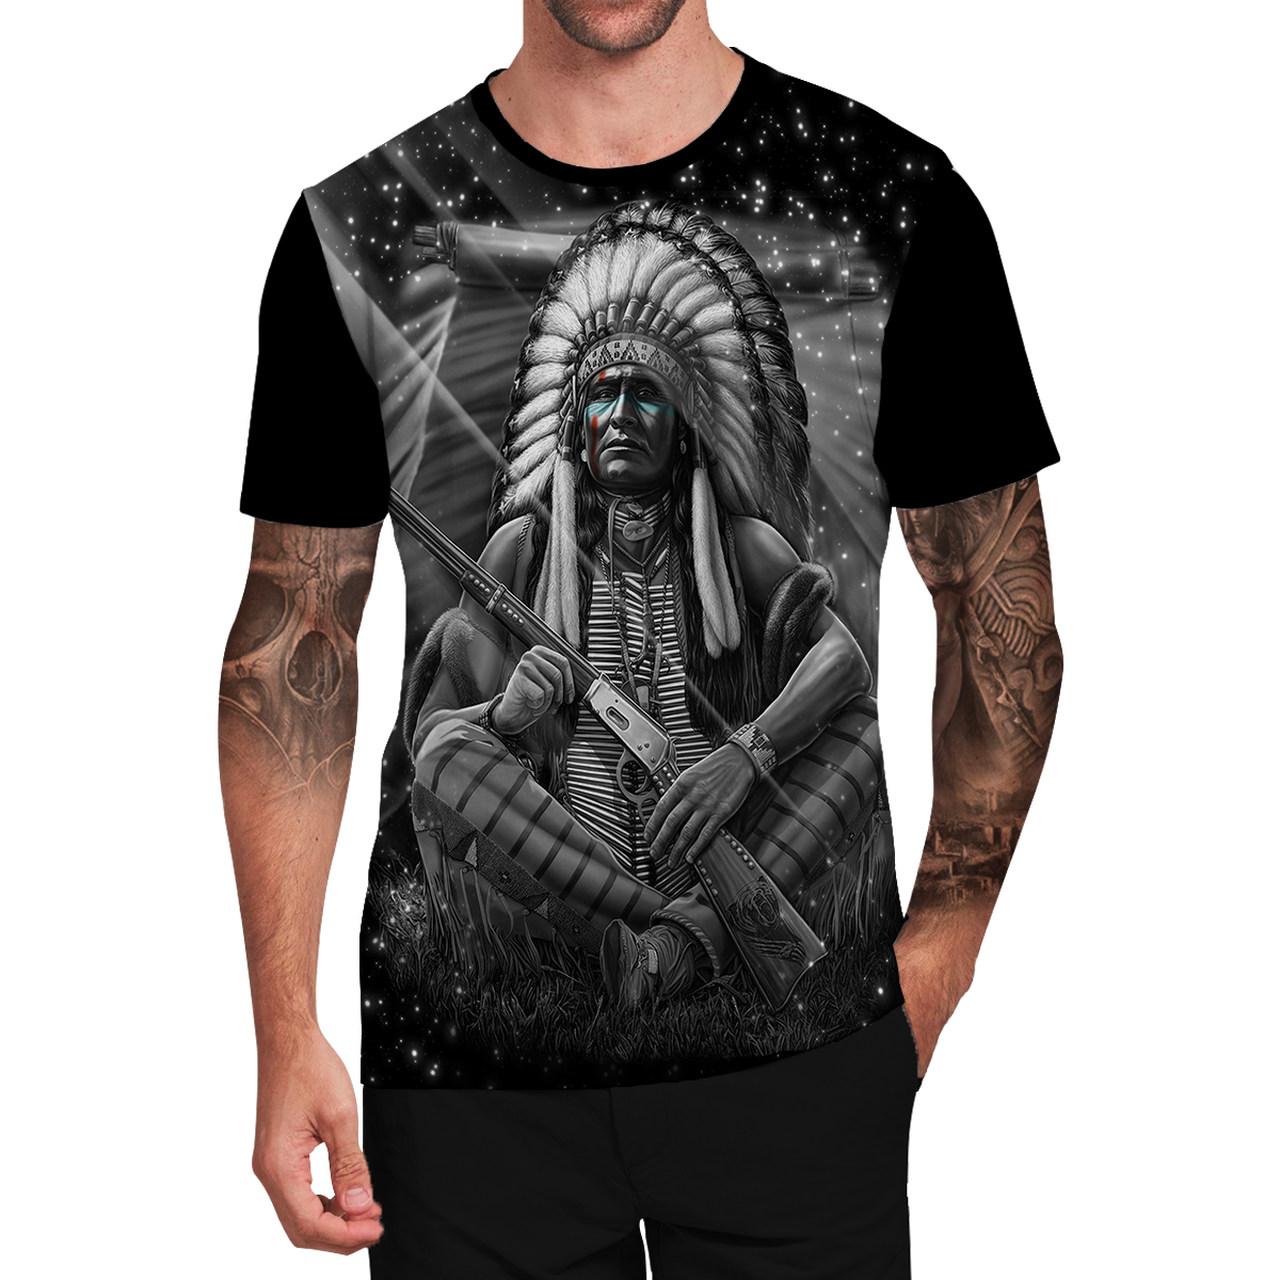 Stompy Camiseta Tattoo Tatuagem Caveira Skull 01